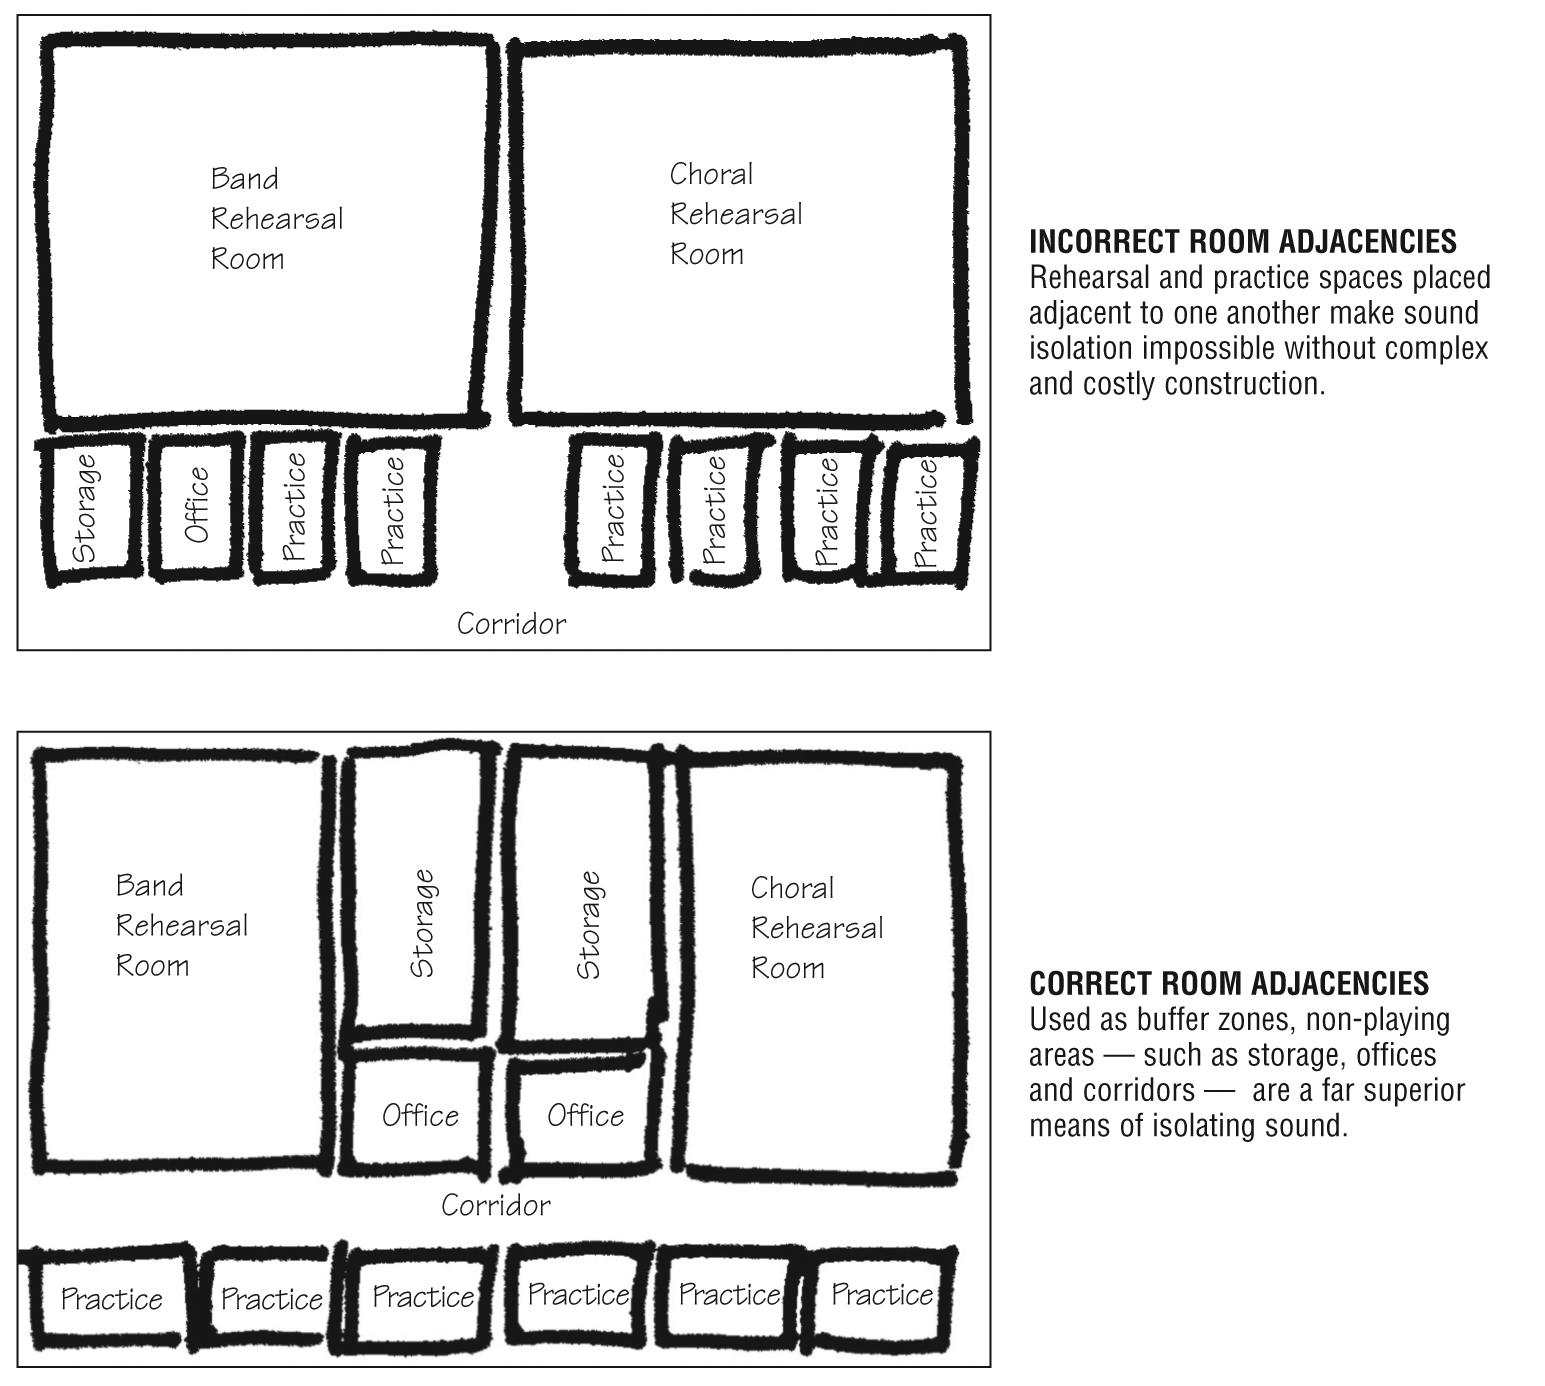 Band Room Diagram Expert Wiring John Deere 2940 Planning Music Suites For Secondary Schools Construction Specifier Rh Constructionspecifier Com Gap